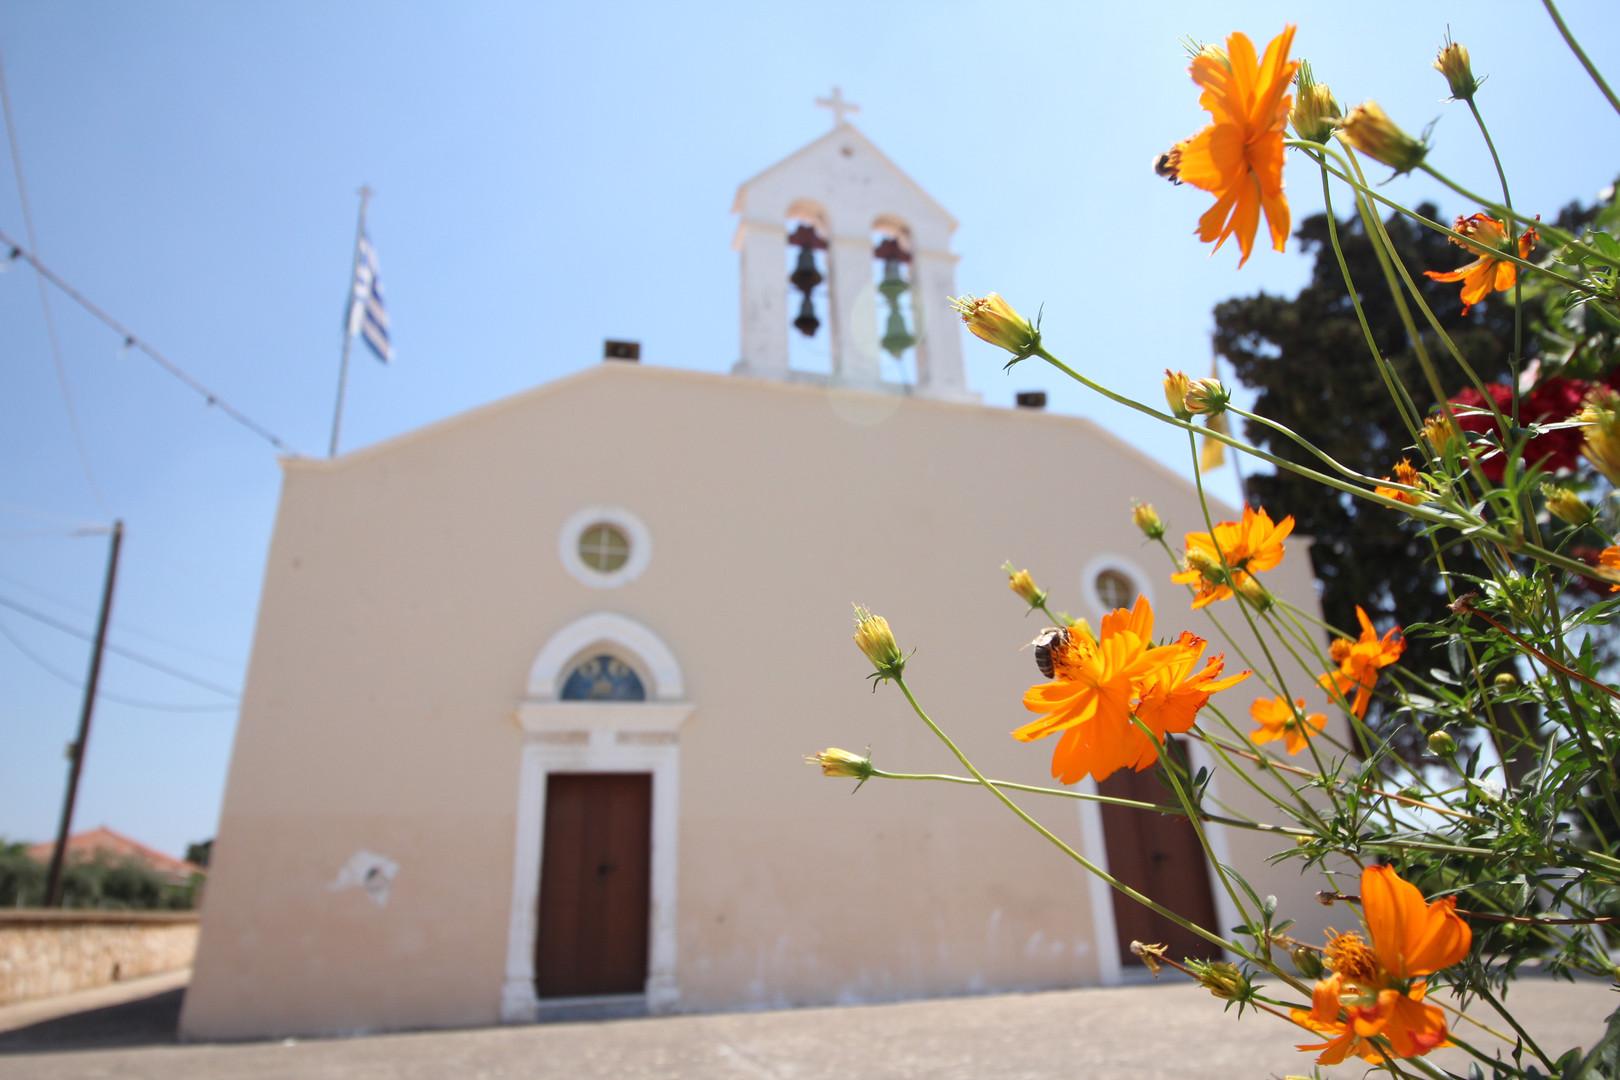 Crete2017-2088.jpg